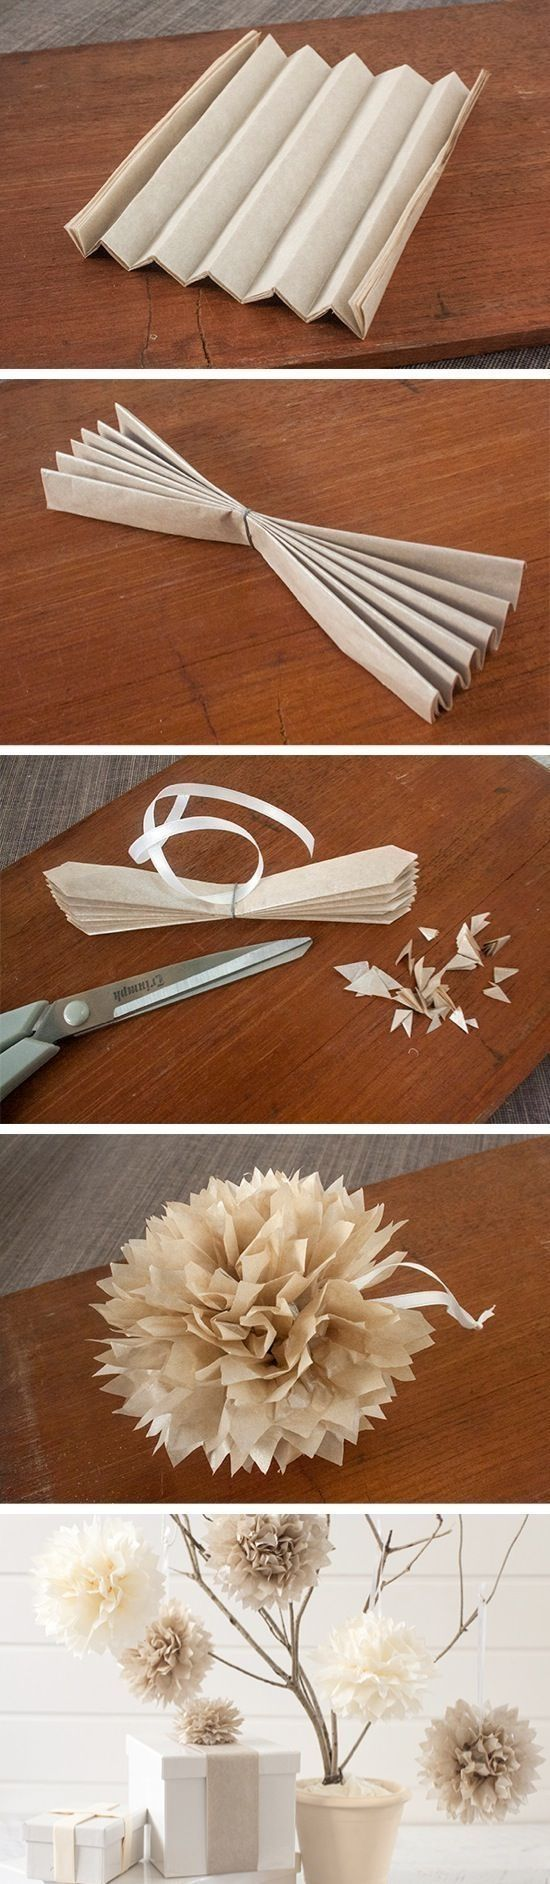 Easy Tissue Paper Pom Poms diy crafts easy crafts diy ideas diy home easy diy for the home crafty decor home ideas diy decorations by Anna by aftr